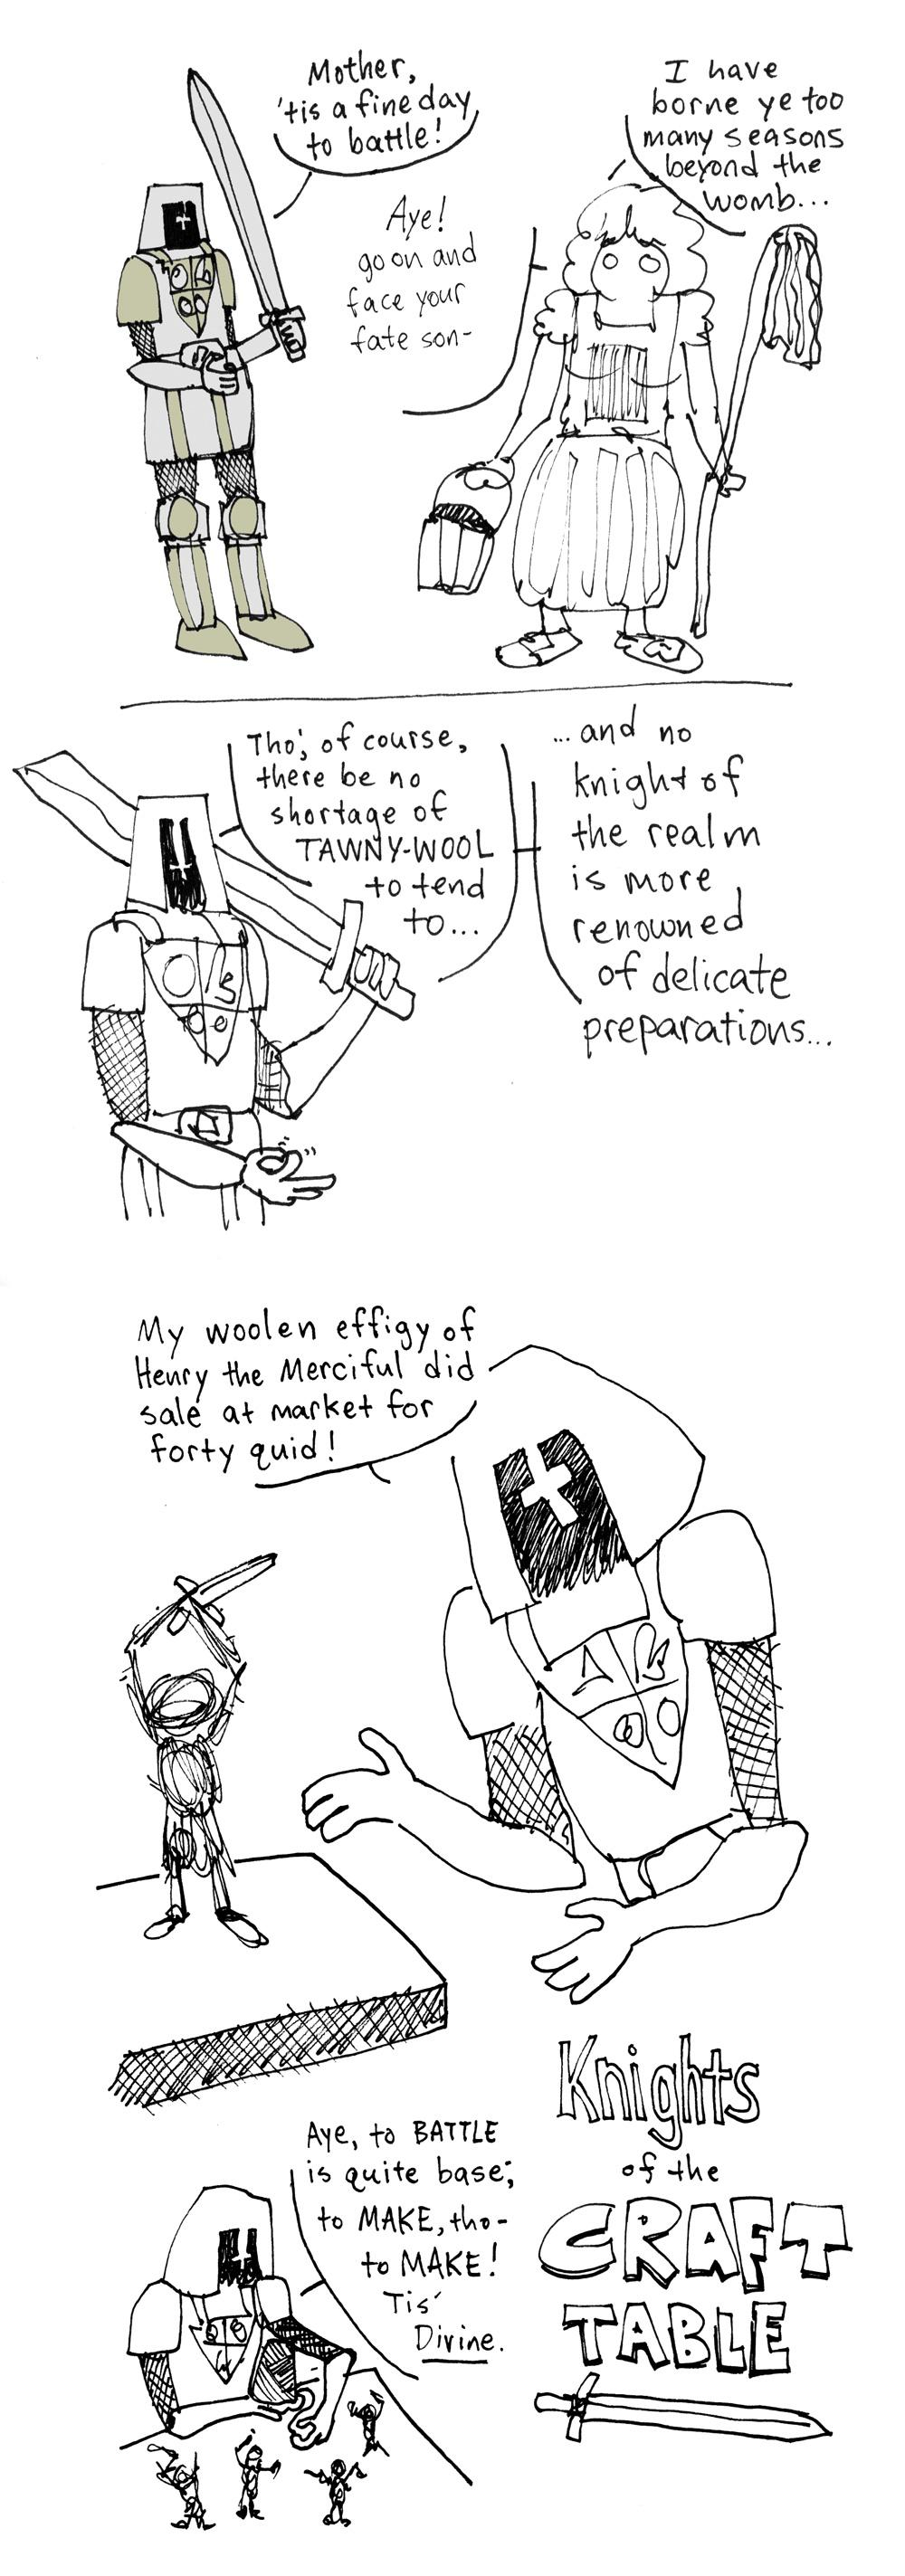 Quick improv comic - image 5 - student project